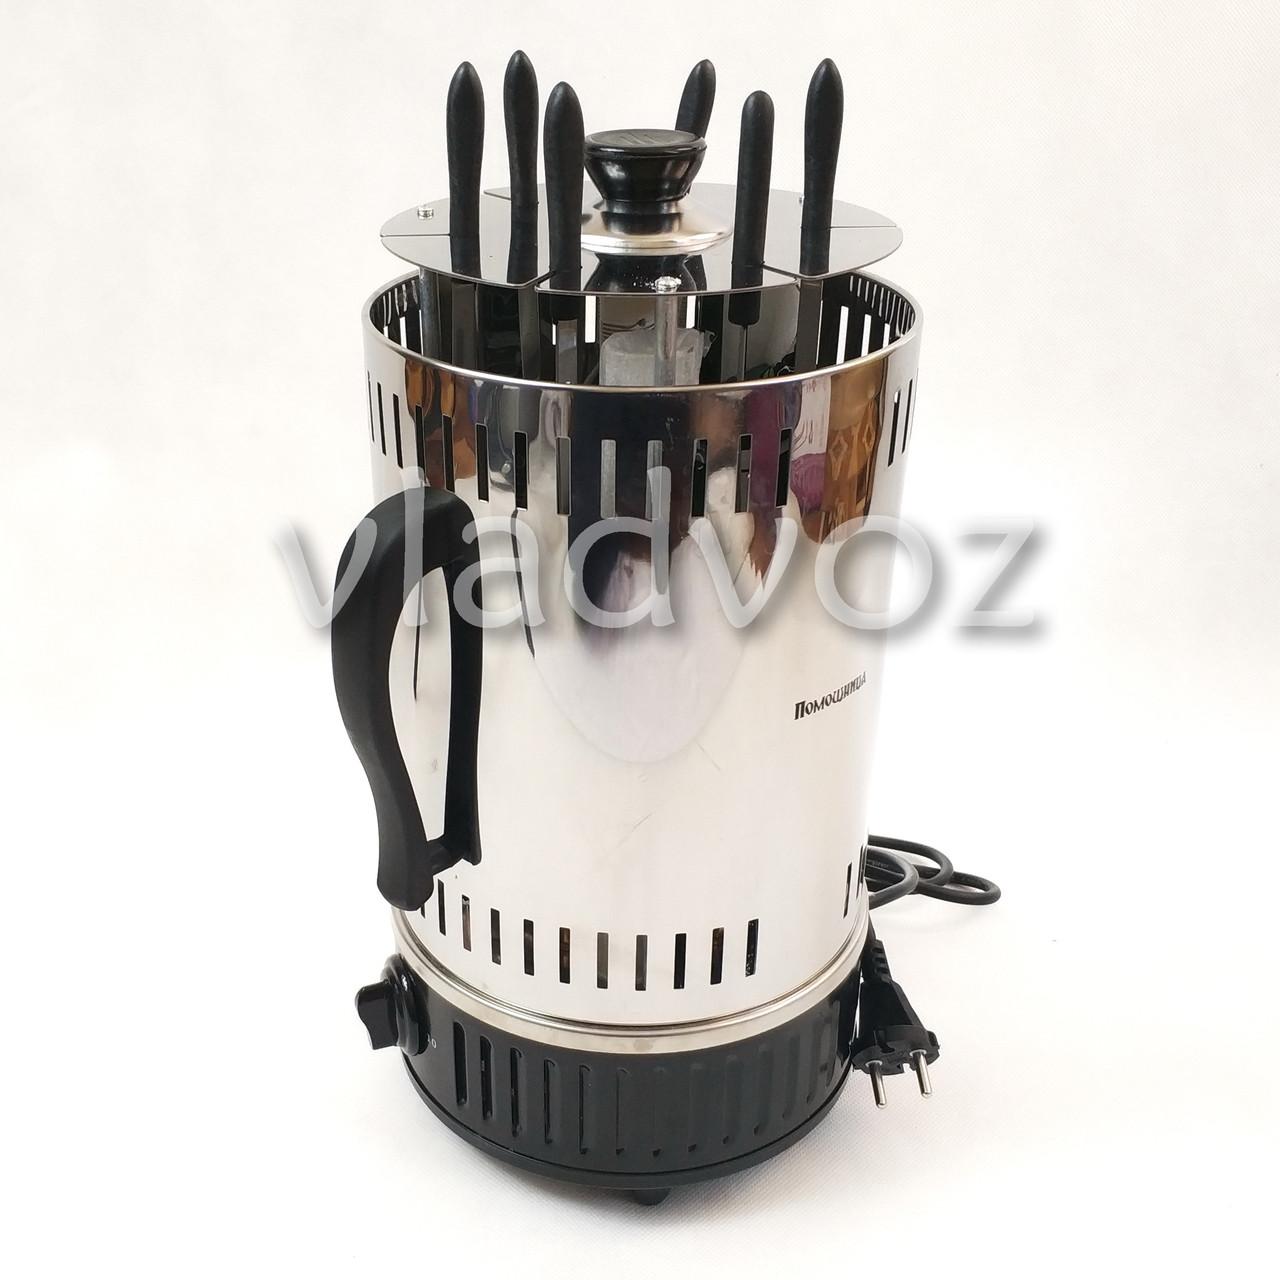 Электрошашлычница Помощница шашлычница шашлык 6 шампуров с таймером